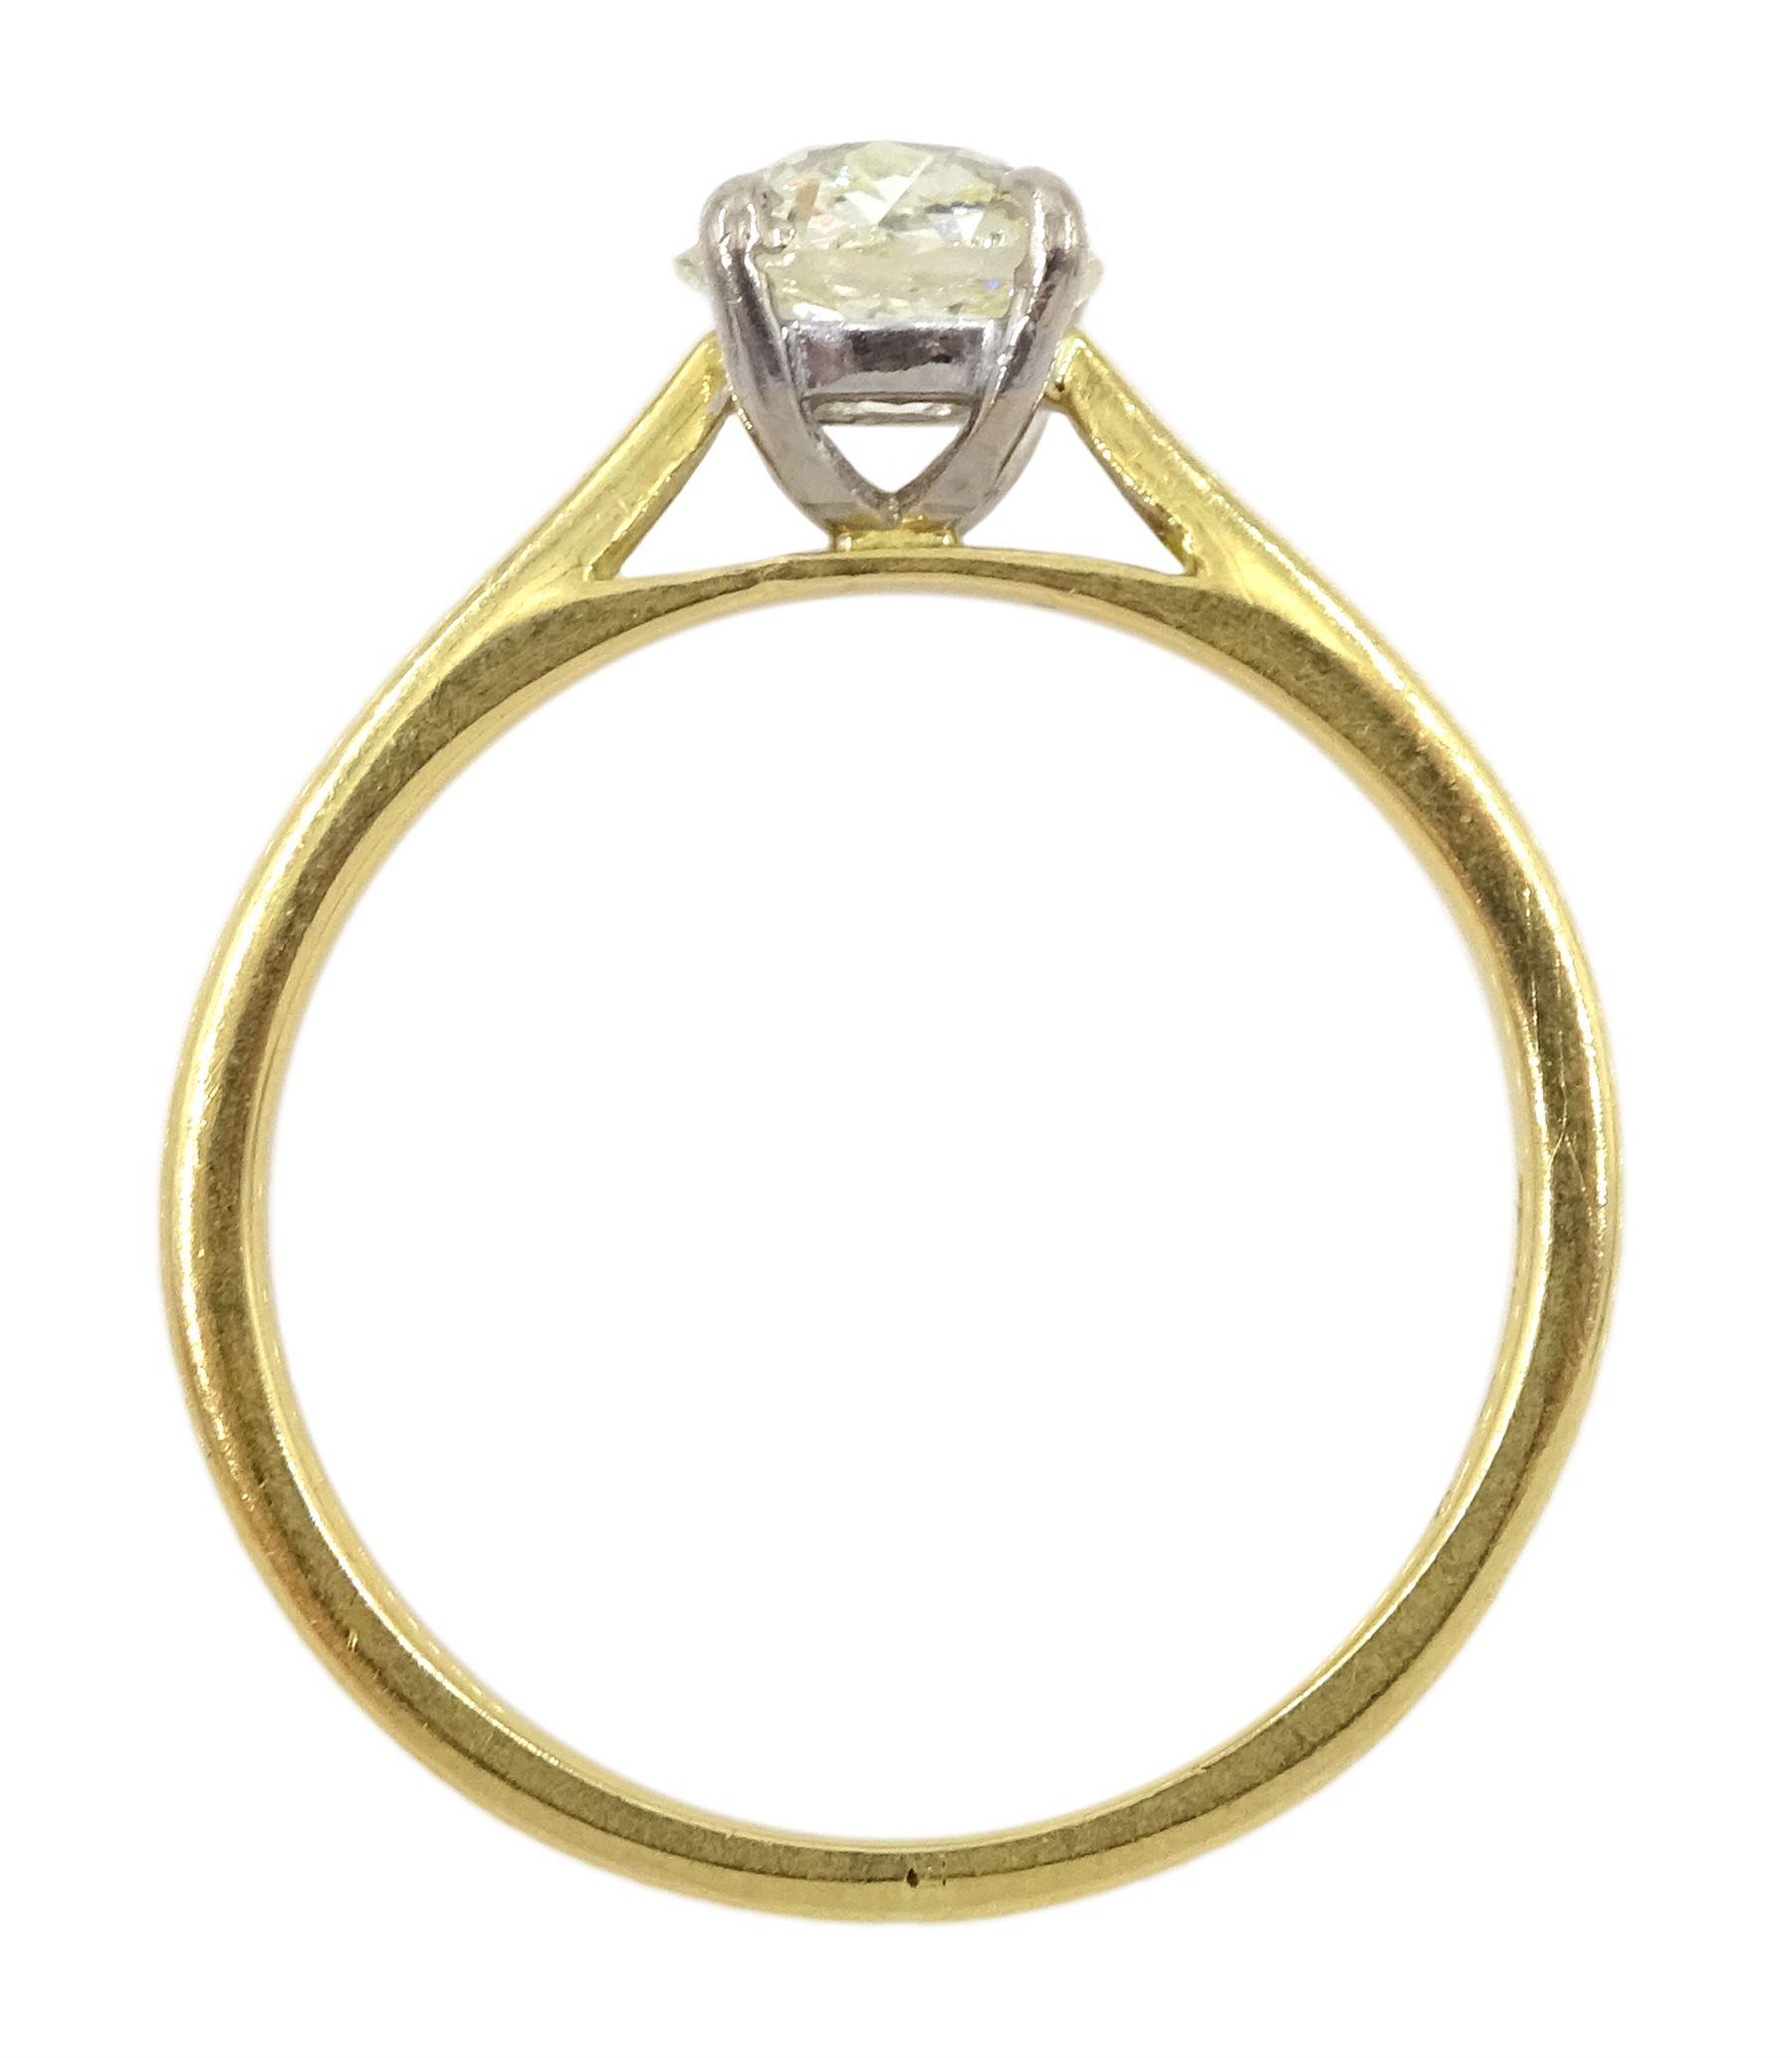 18ct gold single stone old cut diamond ring - Image 4 of 4